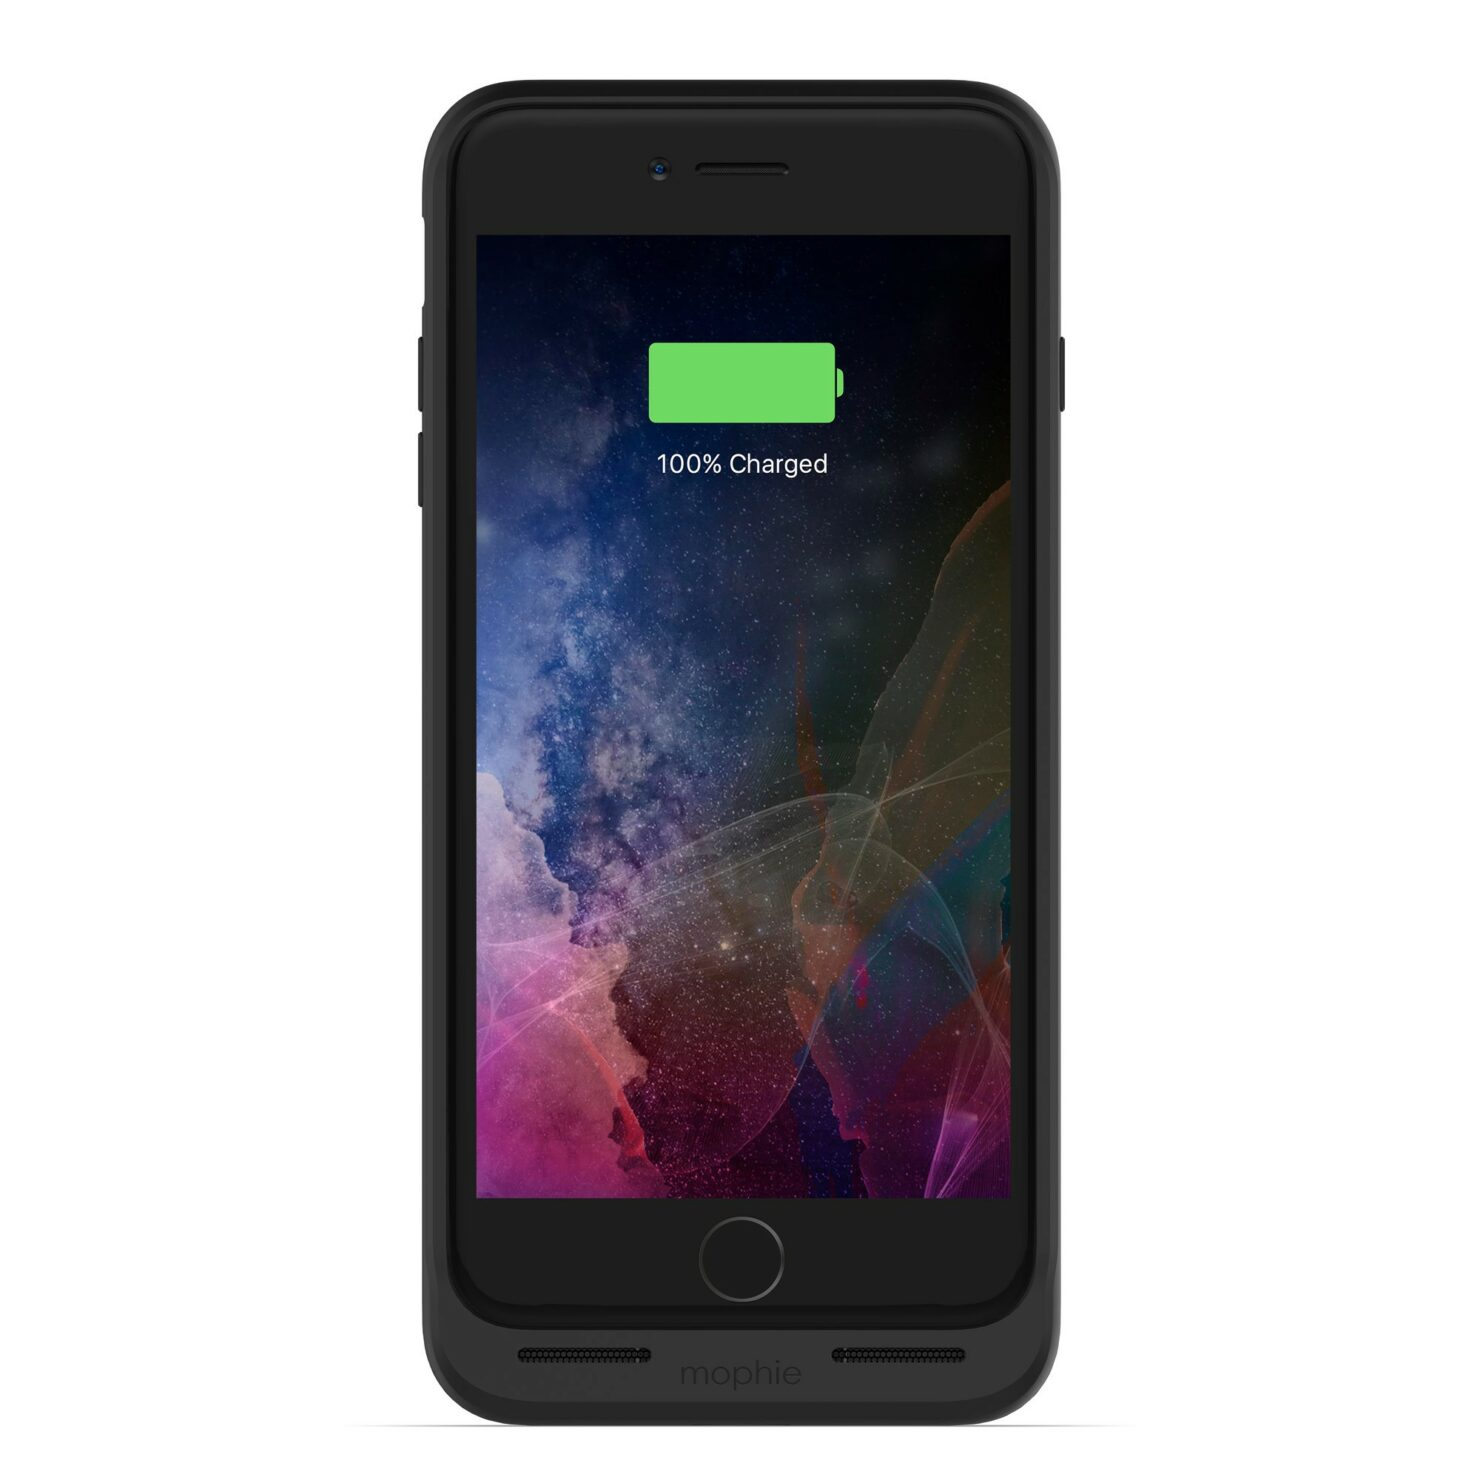 mophie-iphone-7-plus-4